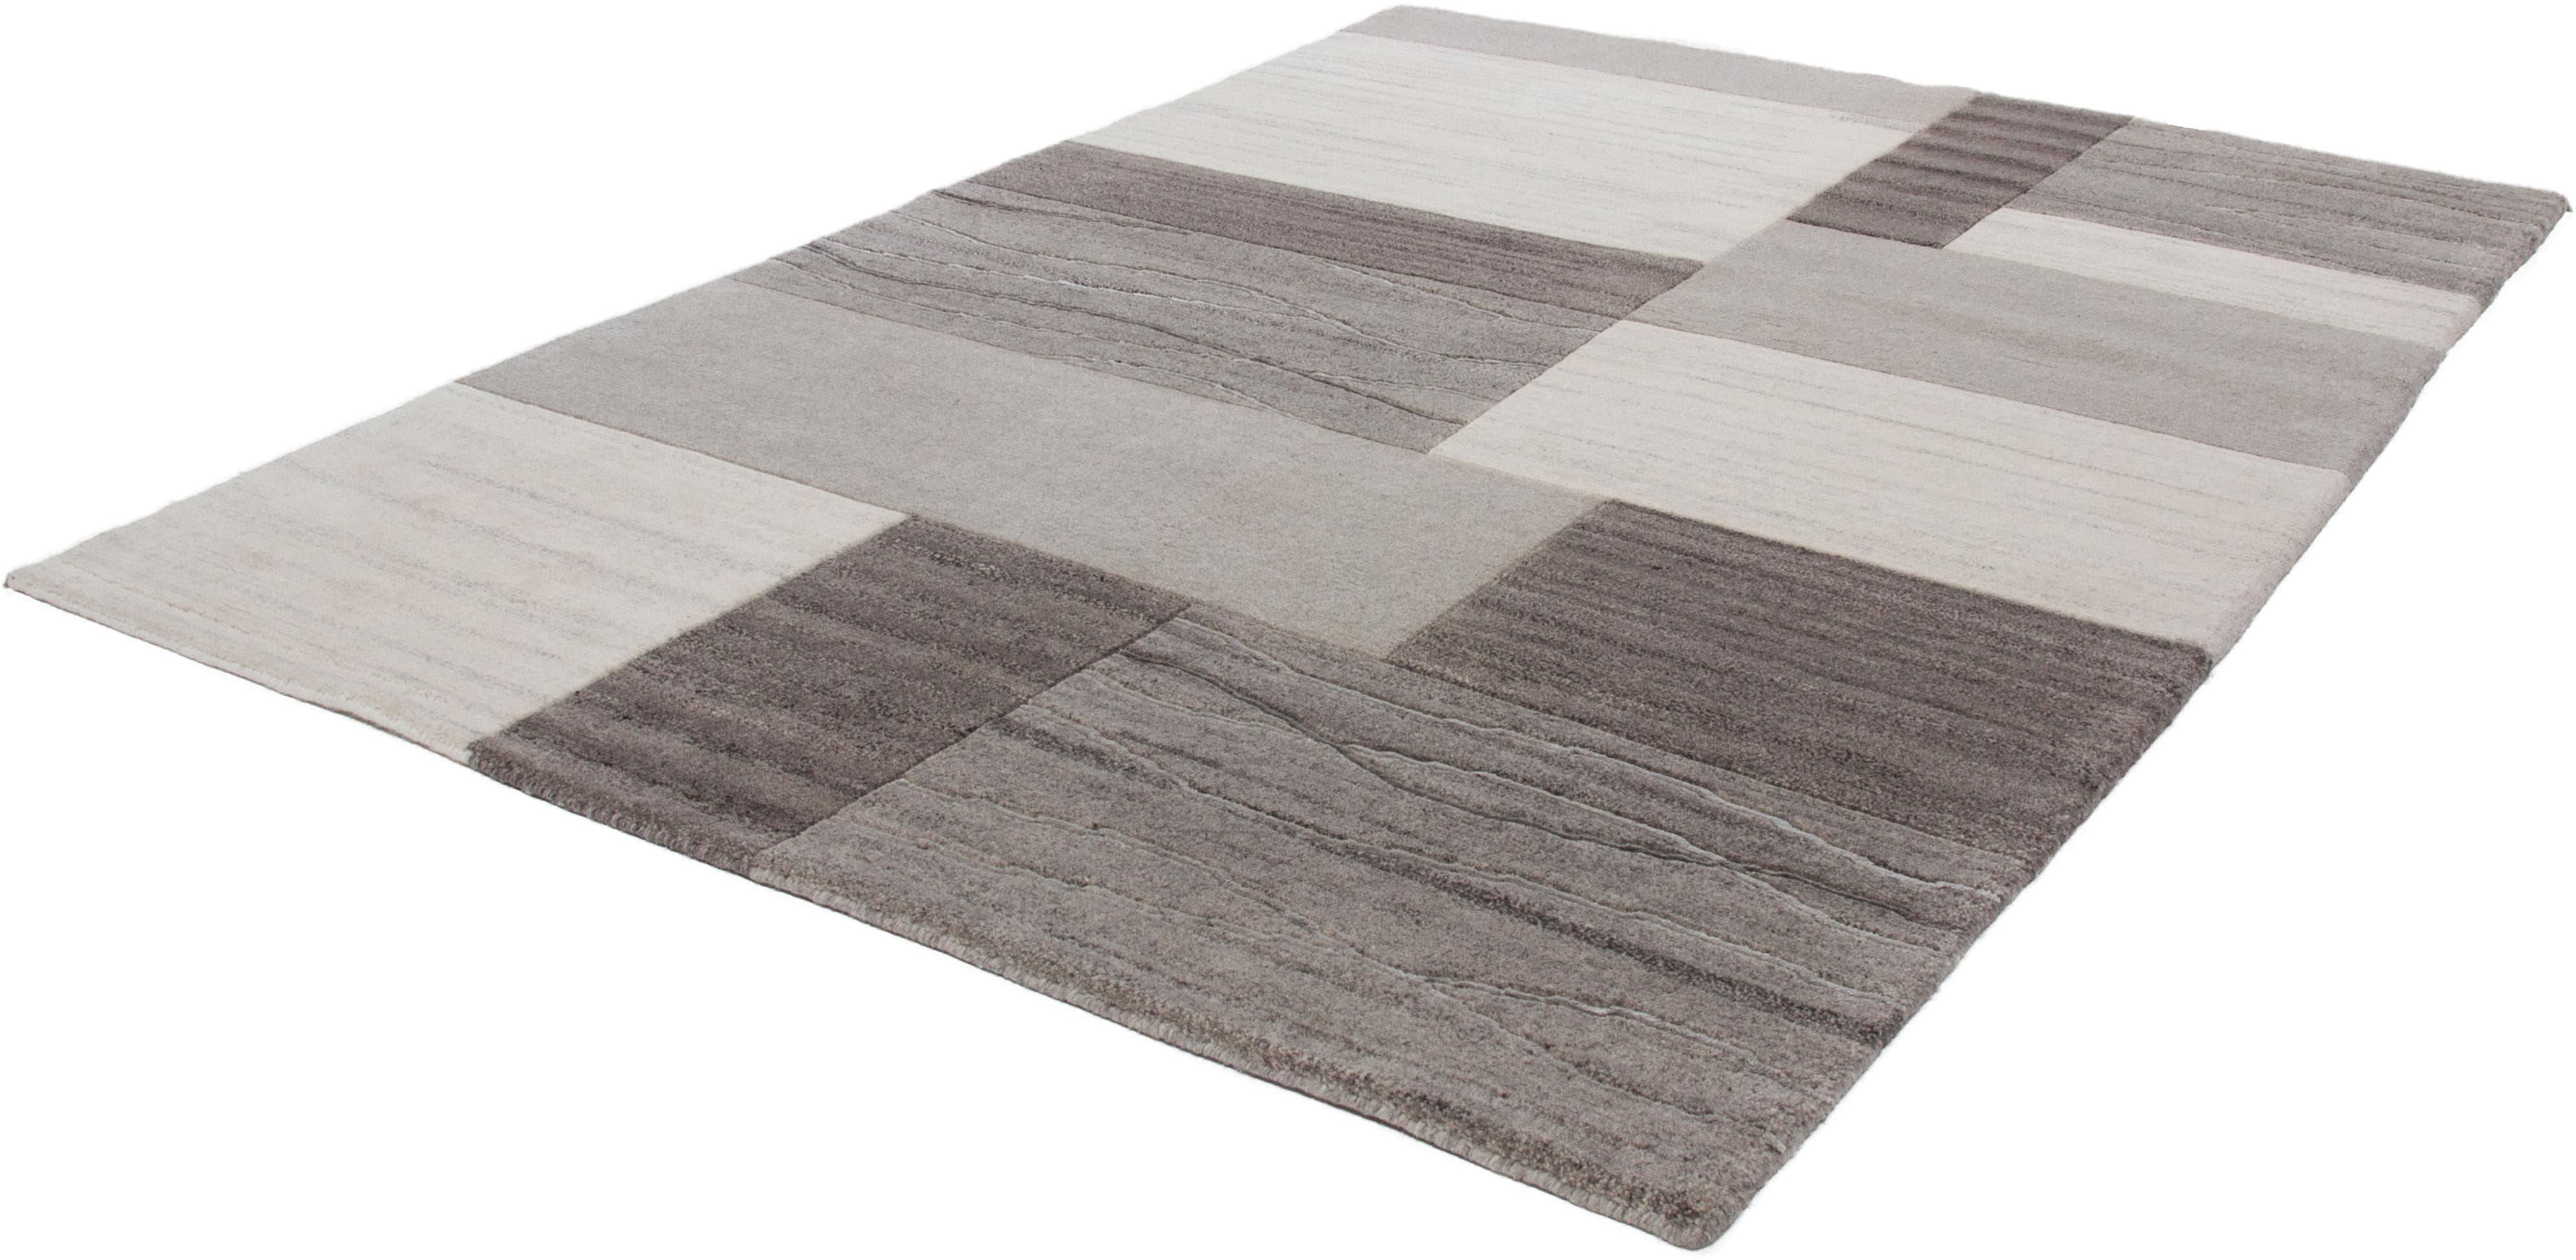 Teppich Goa 952 LALEE rechteckig Höhe 18 mm